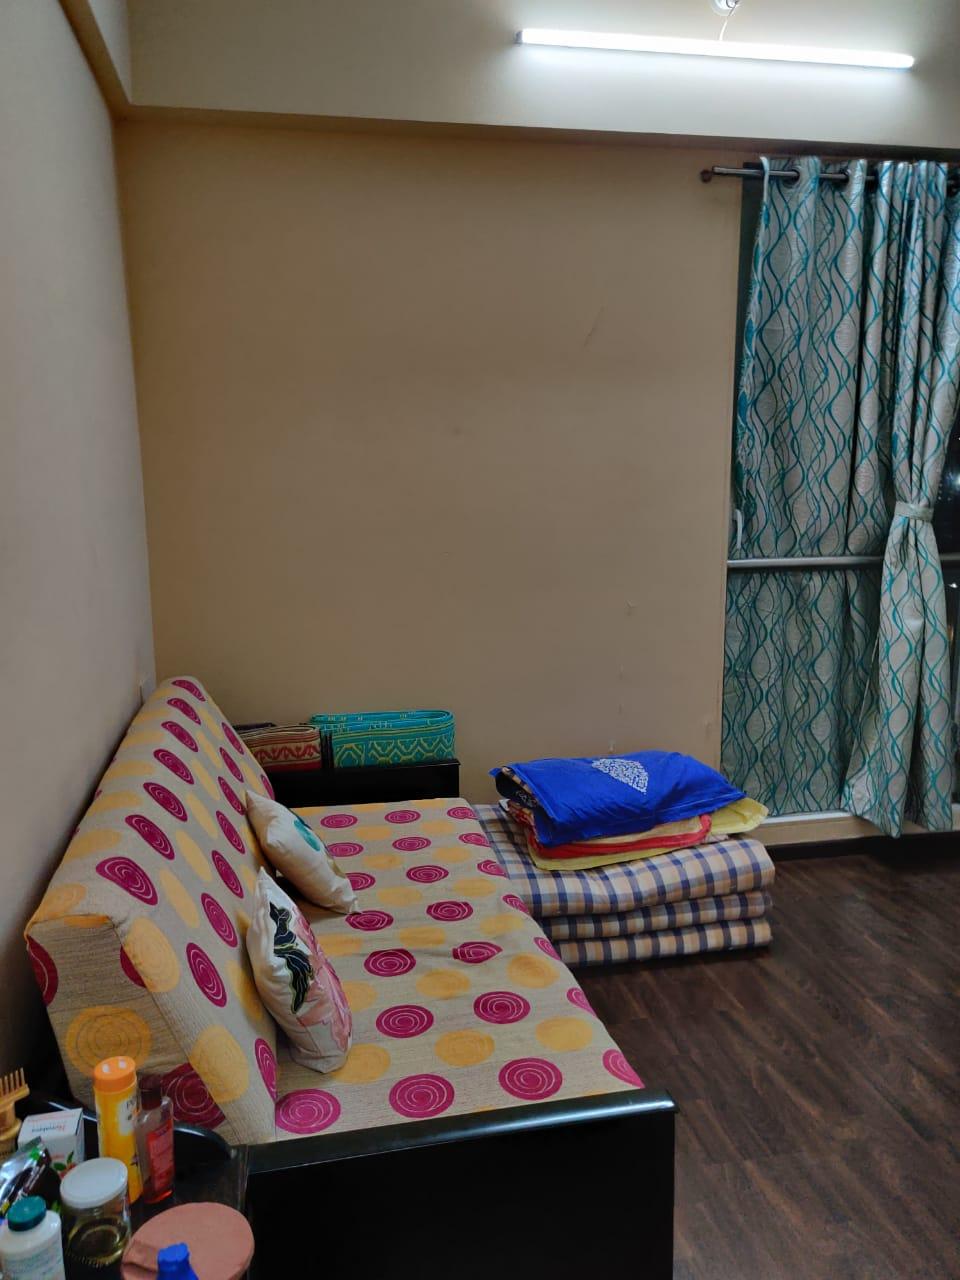 2 Bhk for Sale in Dadar West @ 3.10 Cr